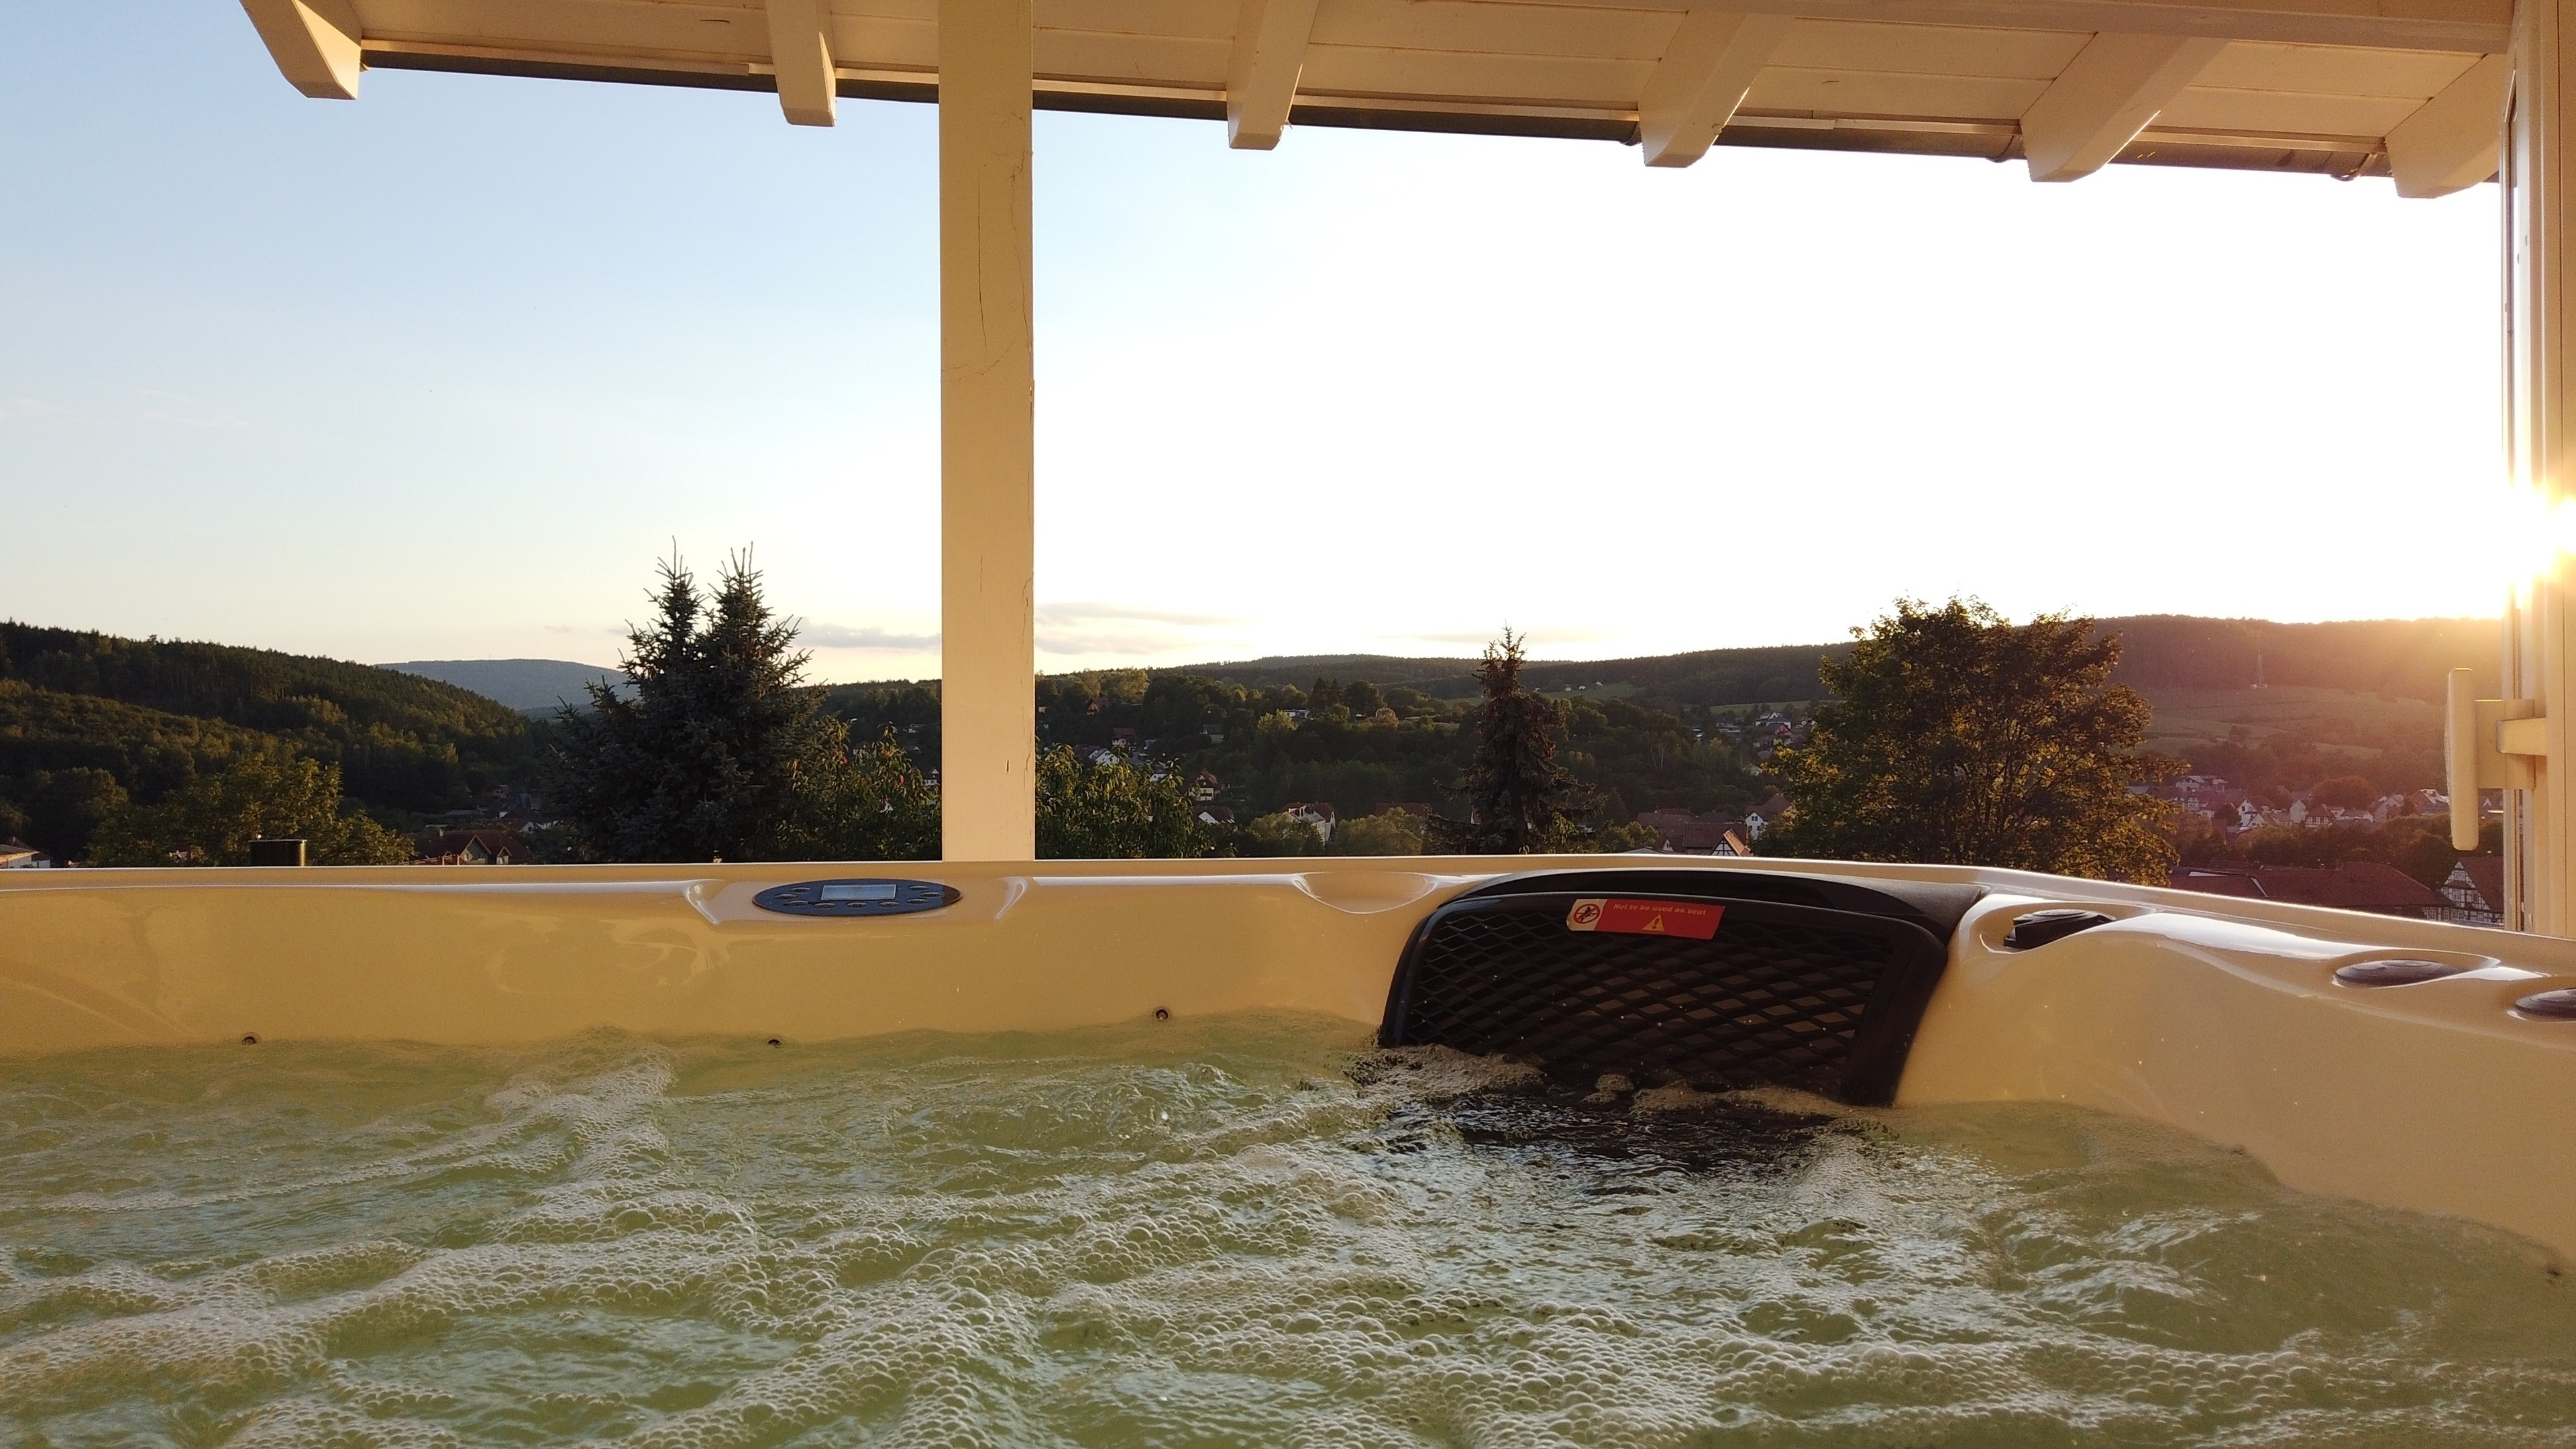 WellnessFerienhaus mit Pool, Sauna, Whirlpool mitt Ferienhaus  Rhön Spessart